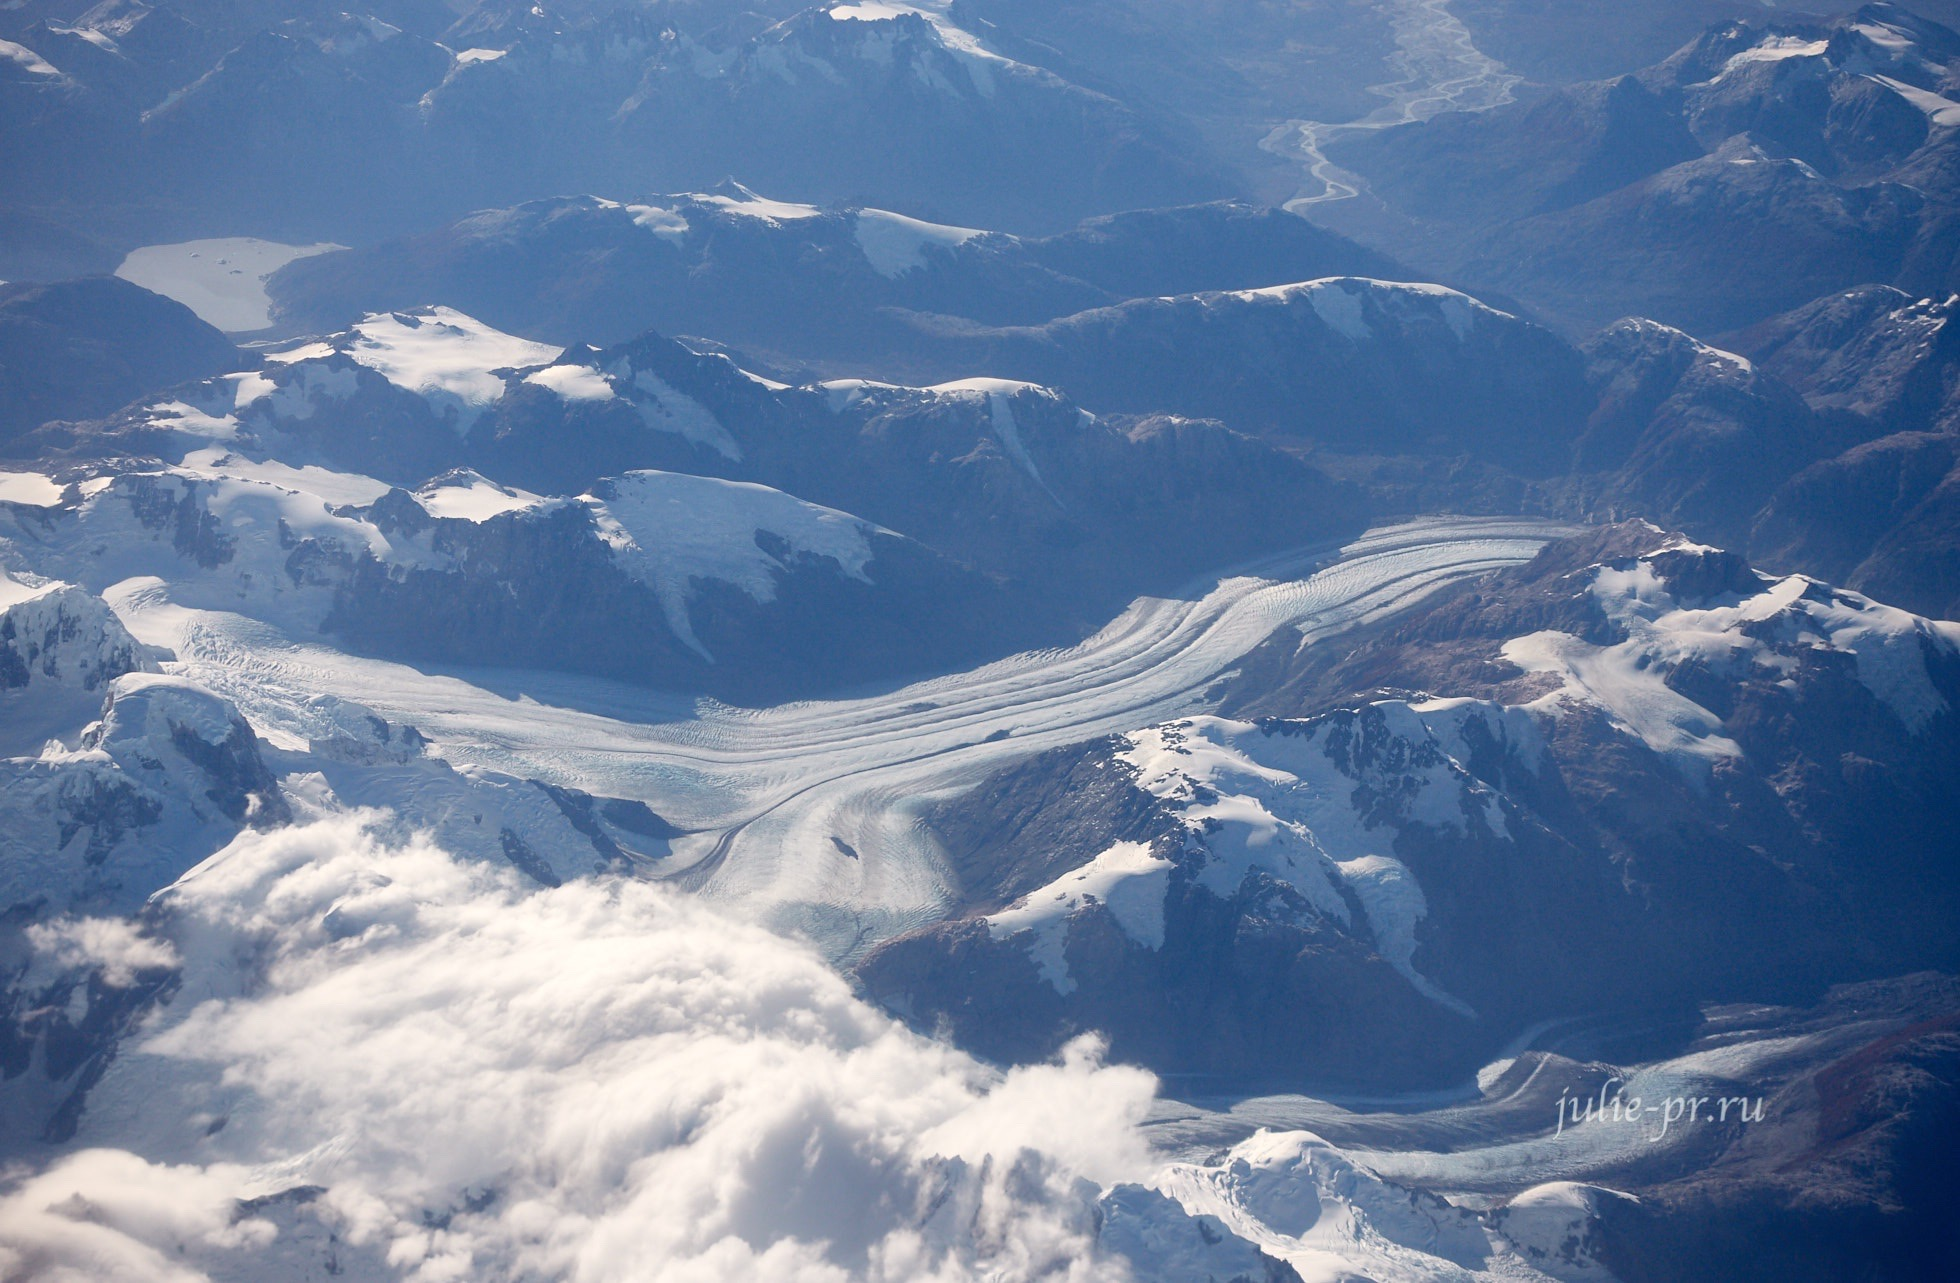 Чили, Патагония, Анды, Ледник